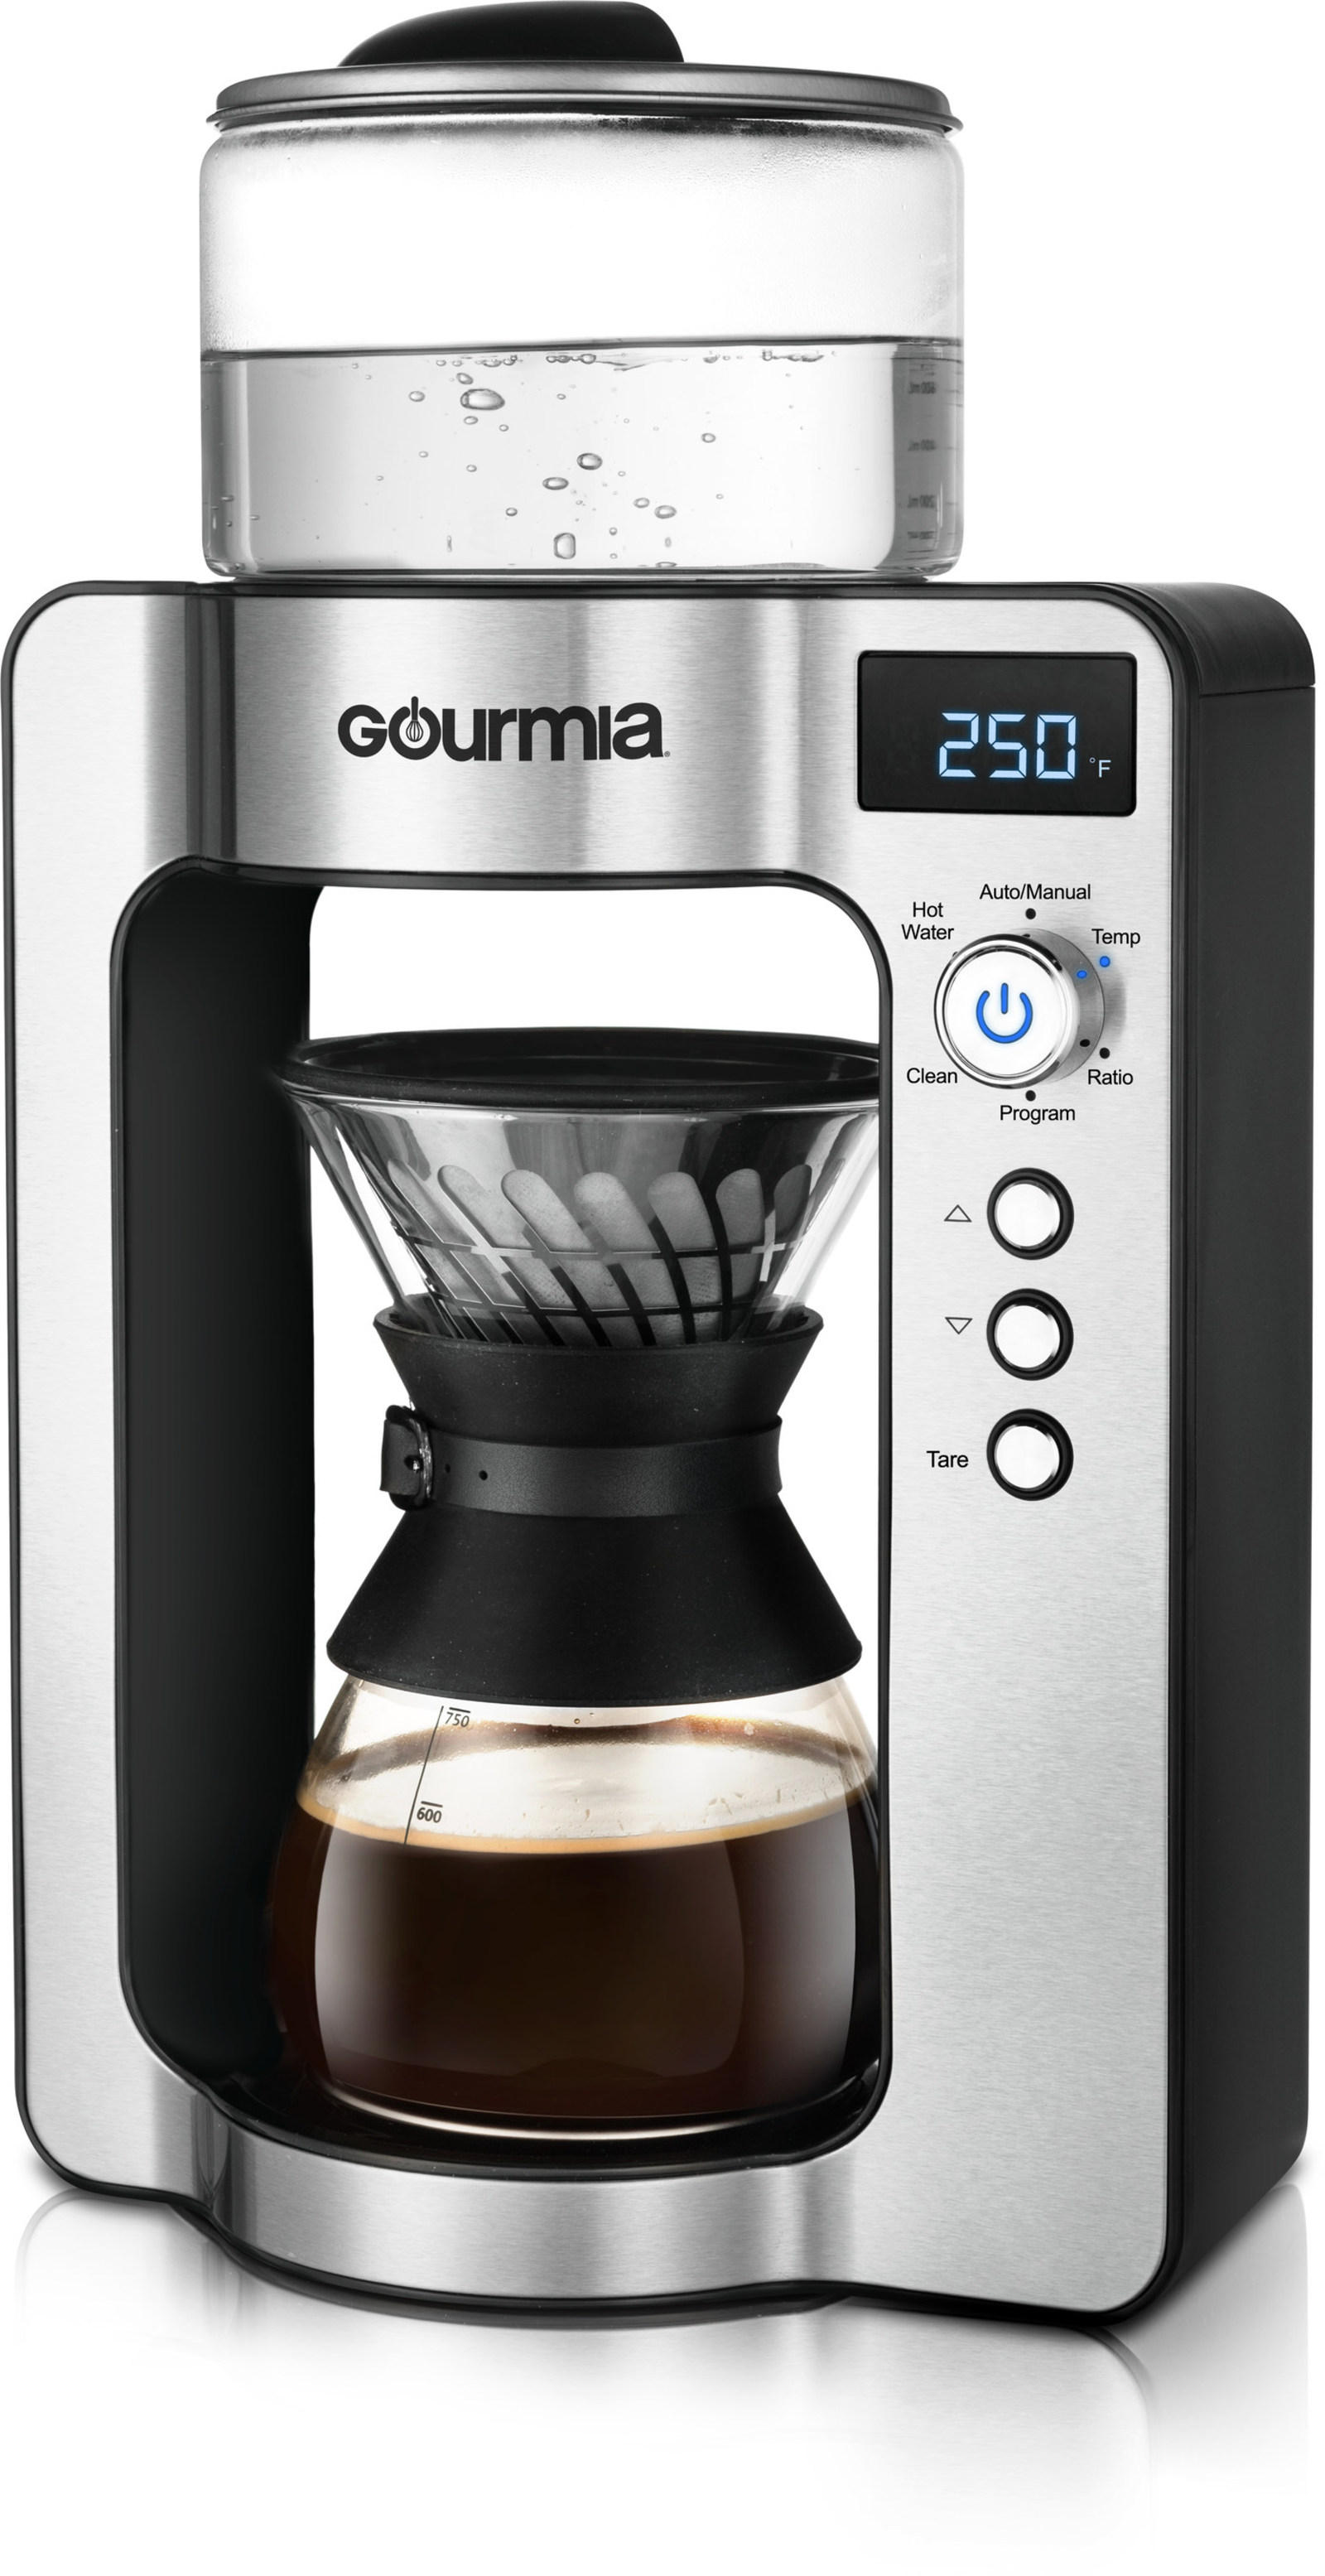 Gourmia Pour Over Coffee Maker